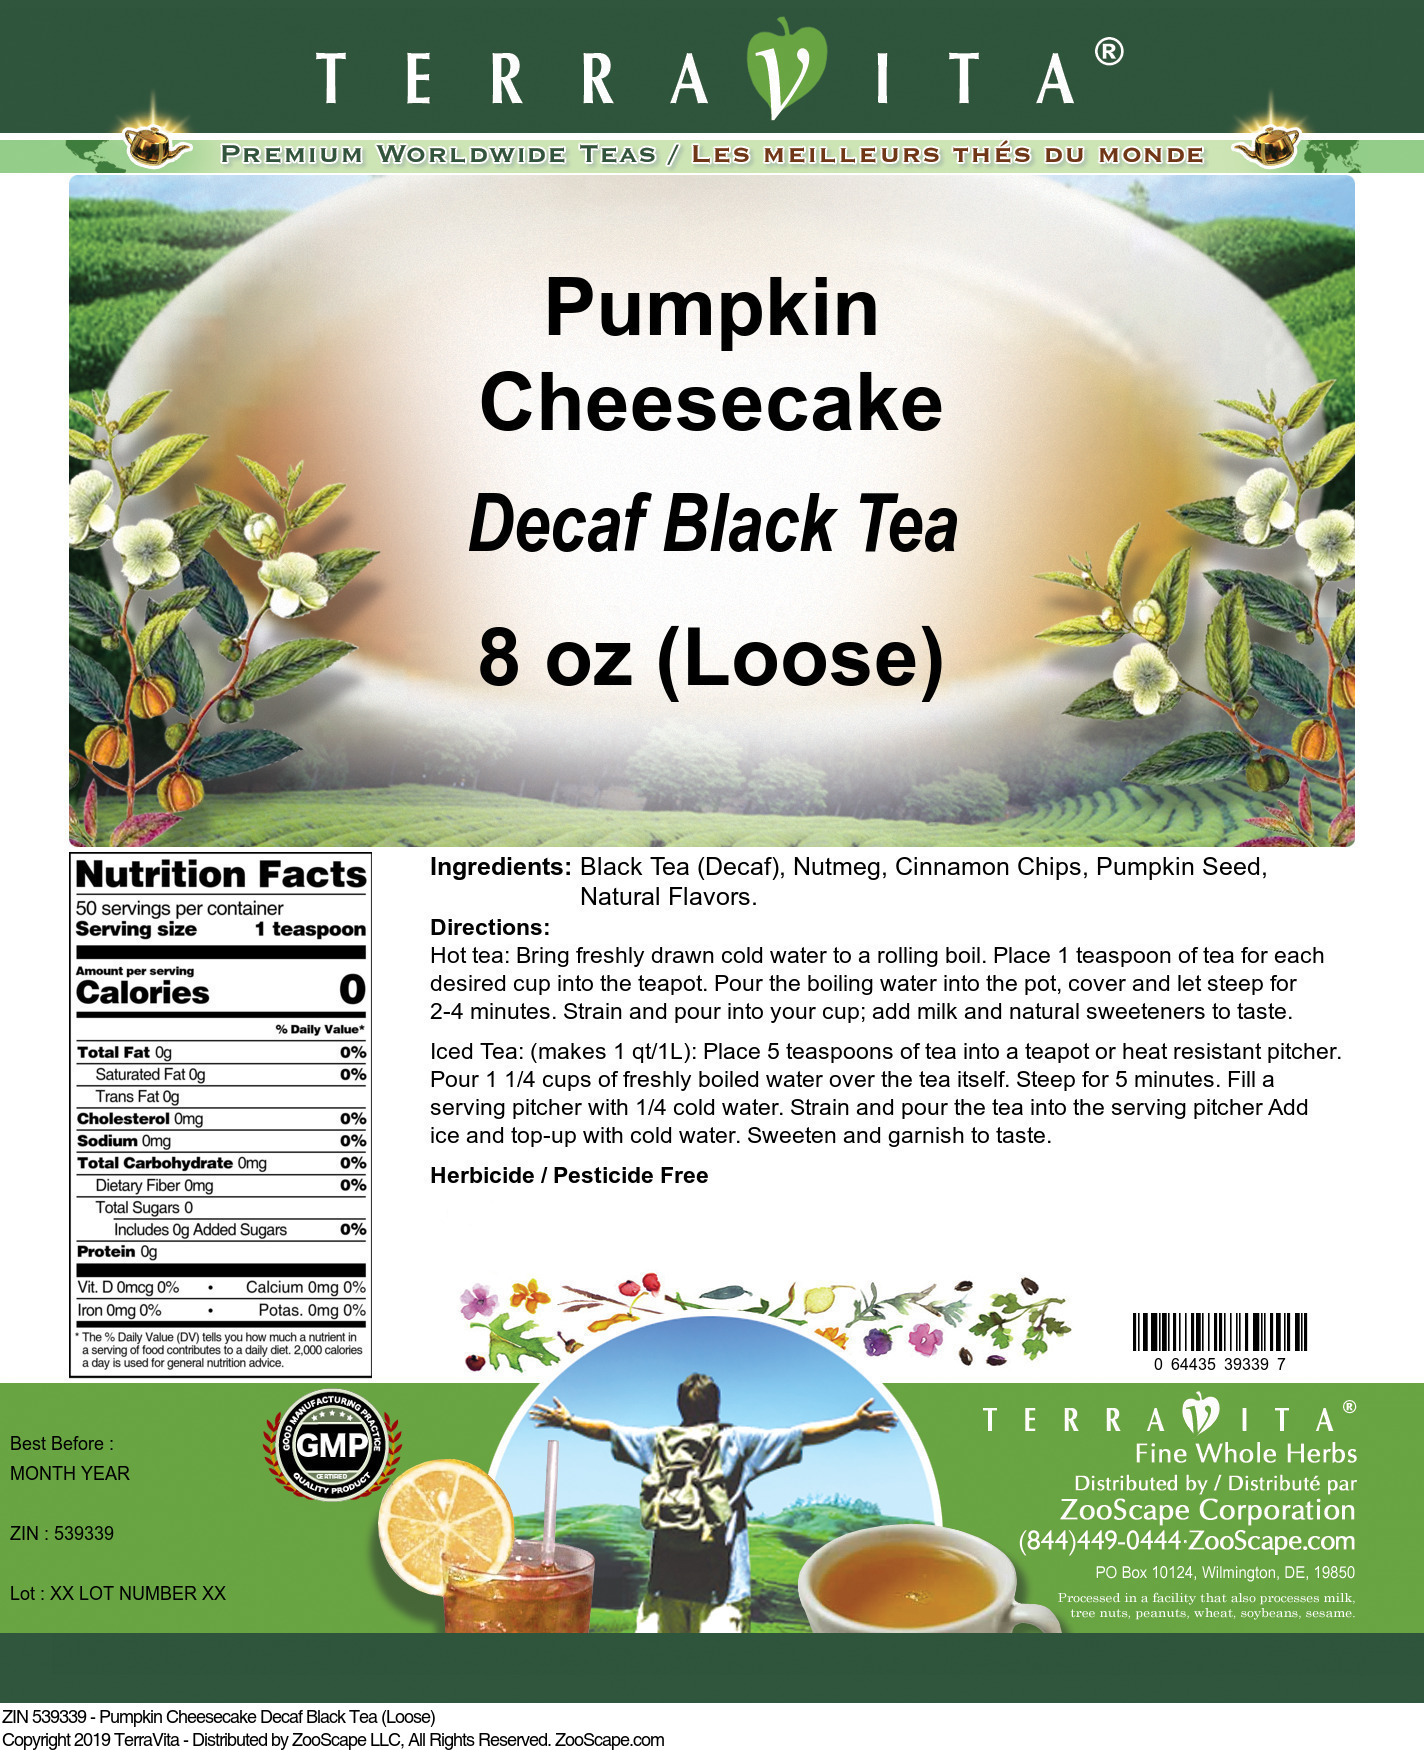 Pumpkin Cheesecake Decaf Black Tea